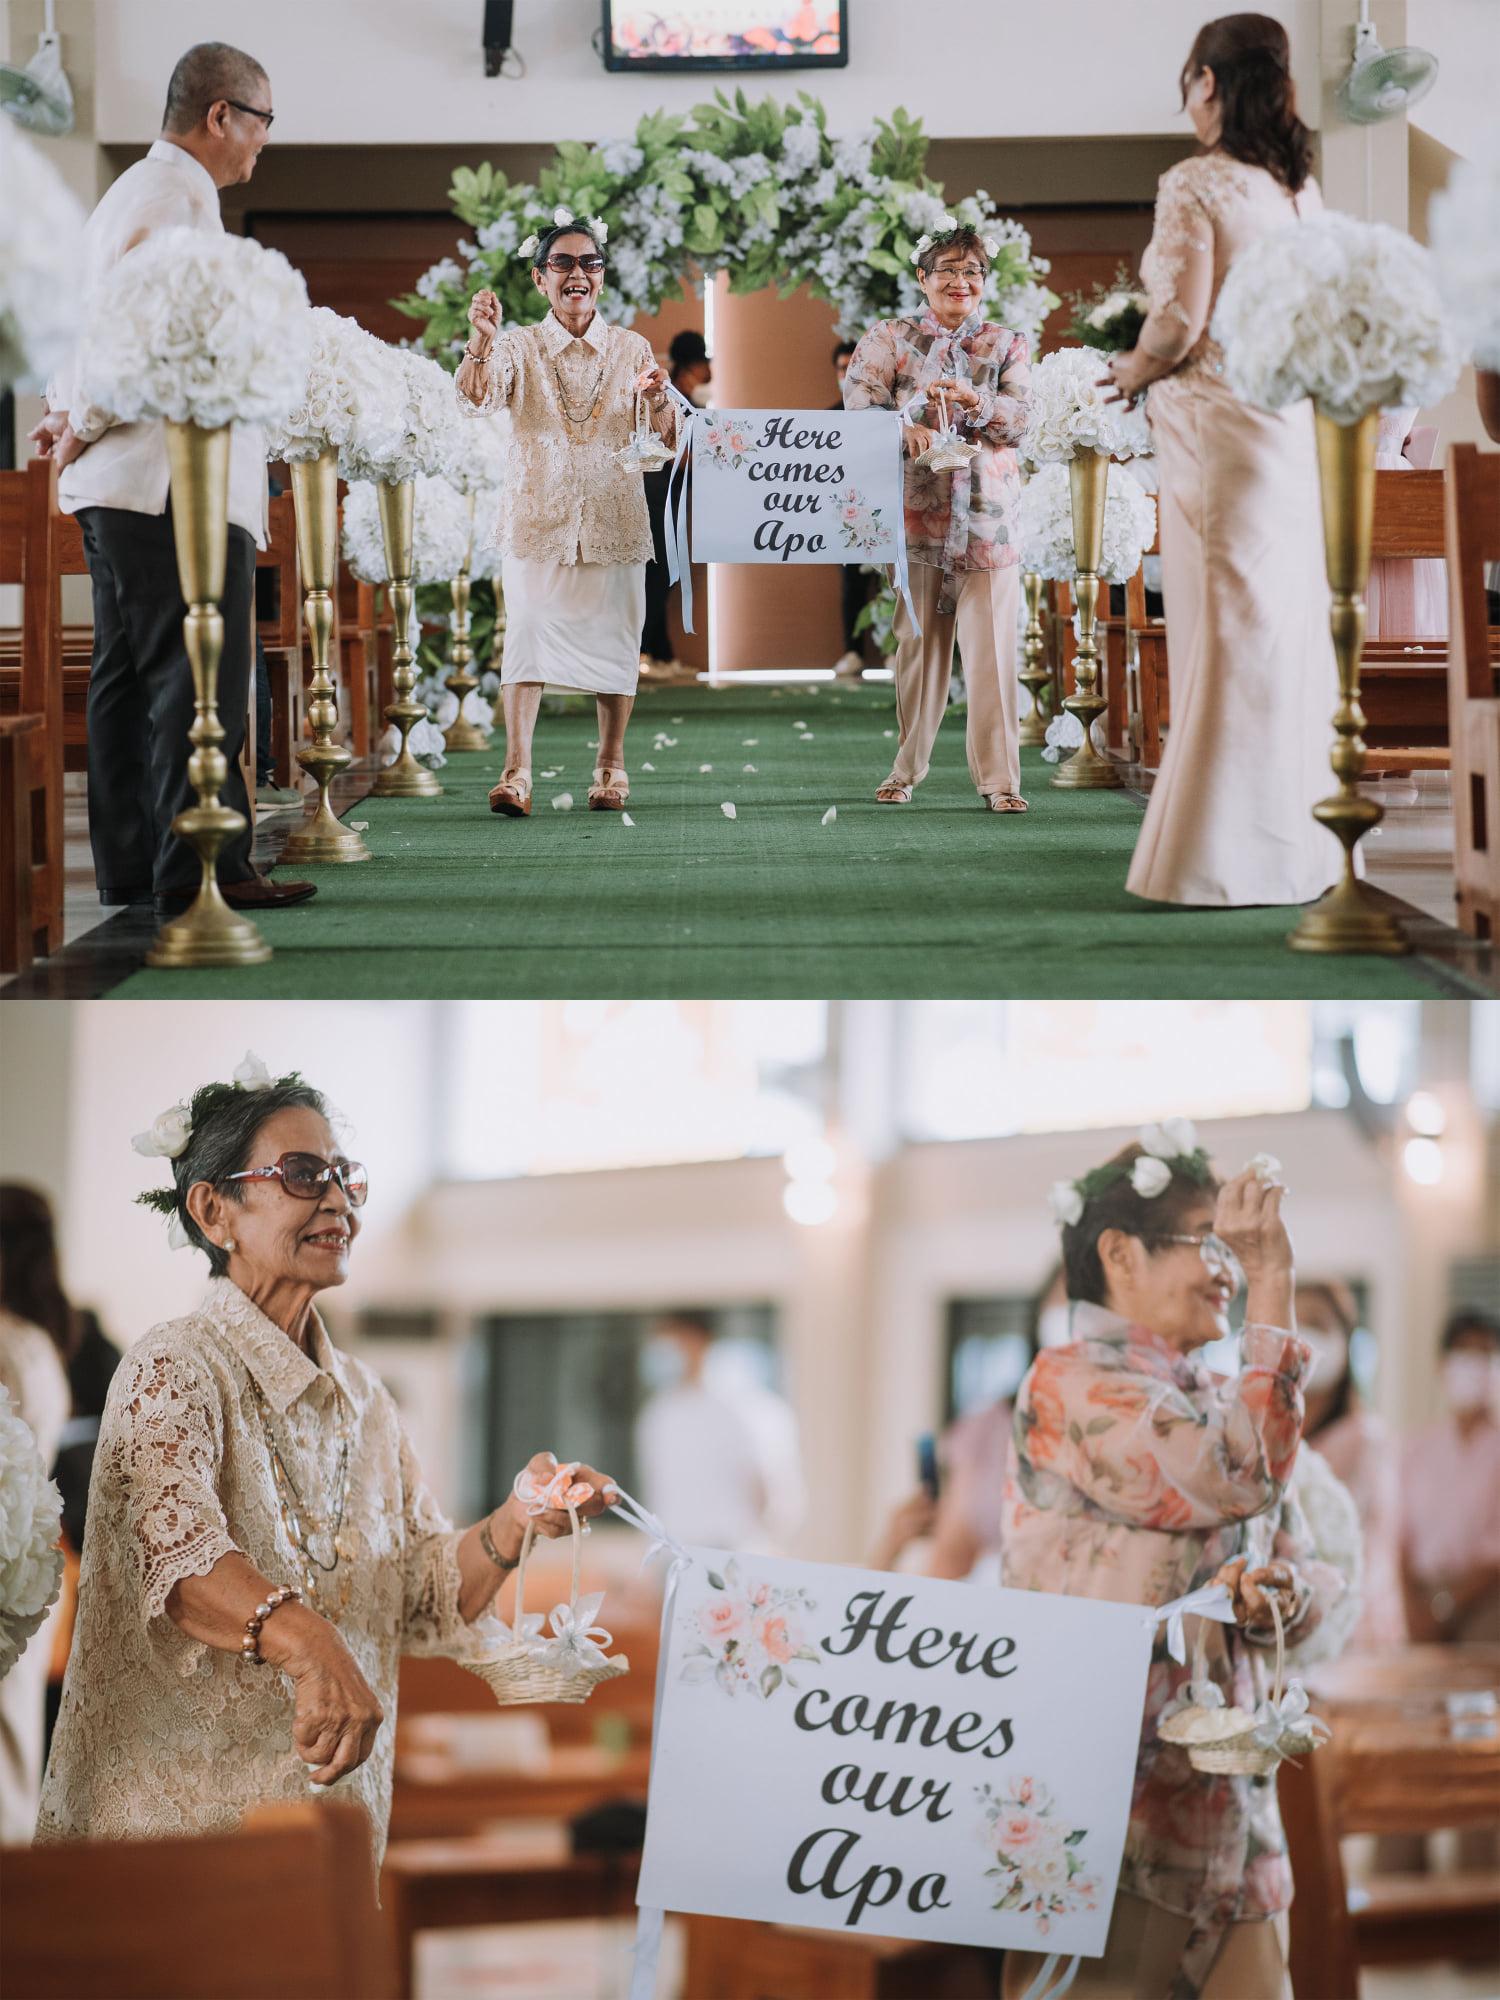 pinoy couple wedding - lolas as flower girls